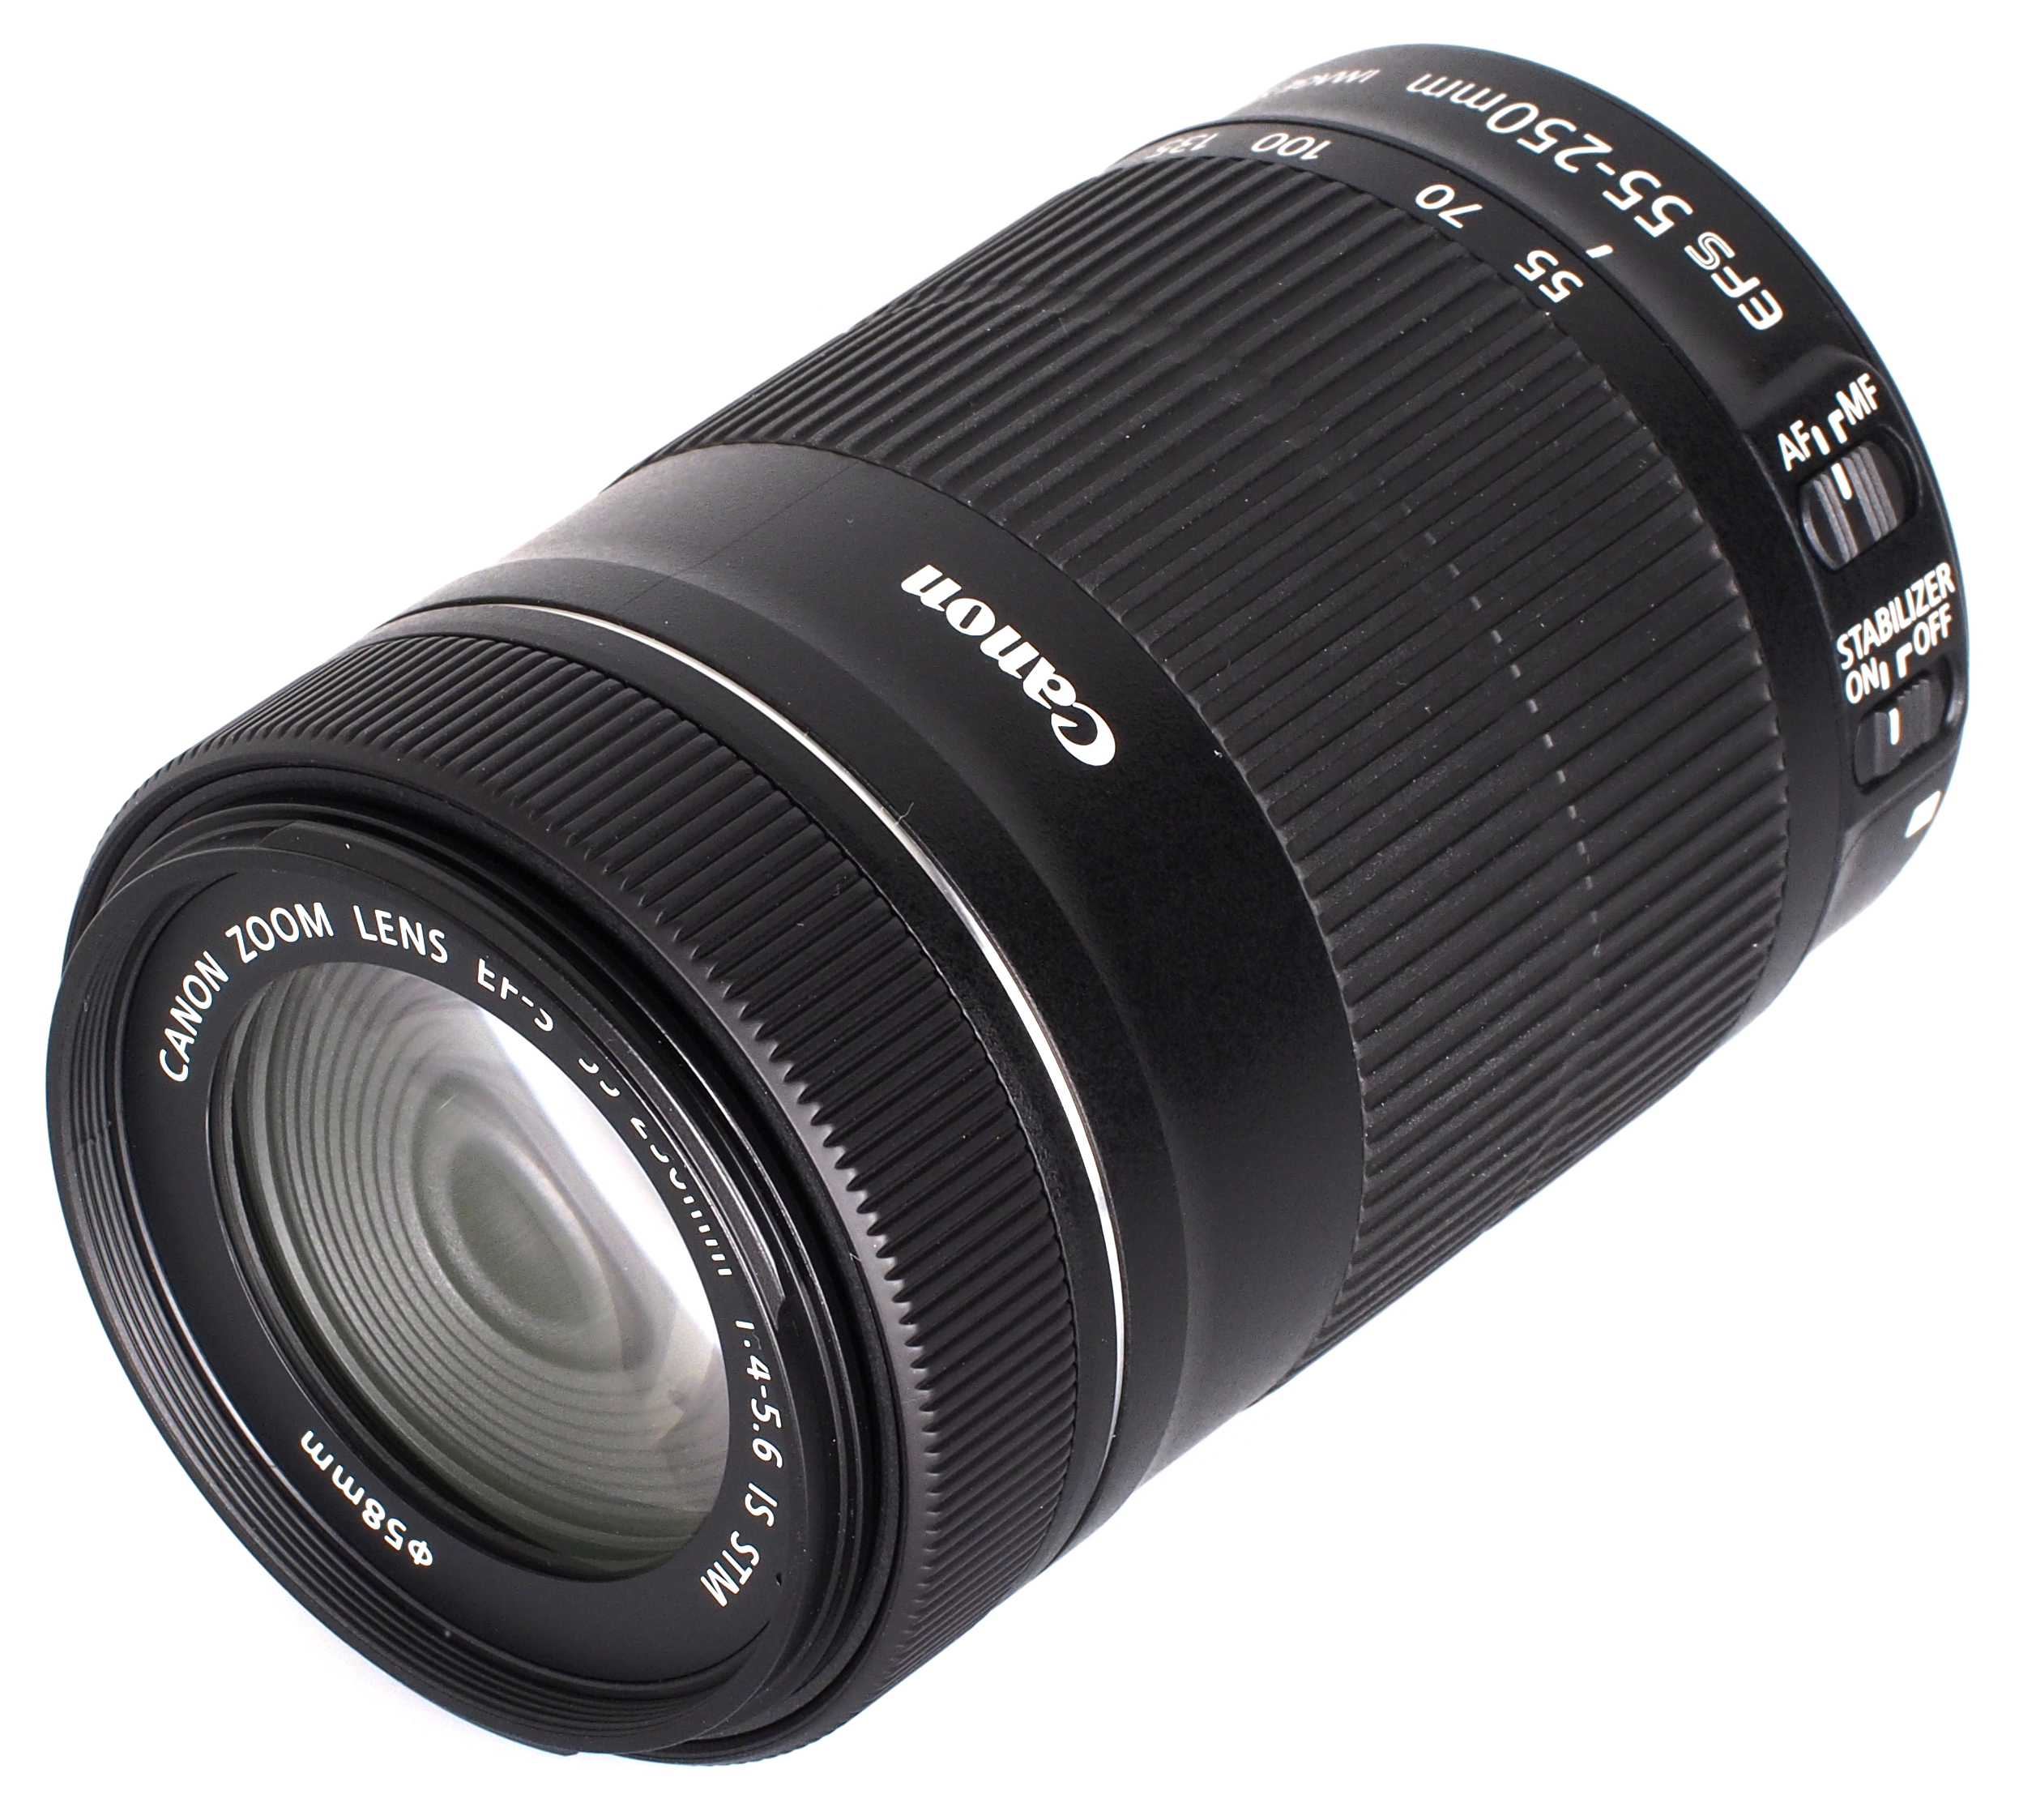 Canon EF-S 55-250mm f/4-5.6 IS – ваш перший телеоб'єктив